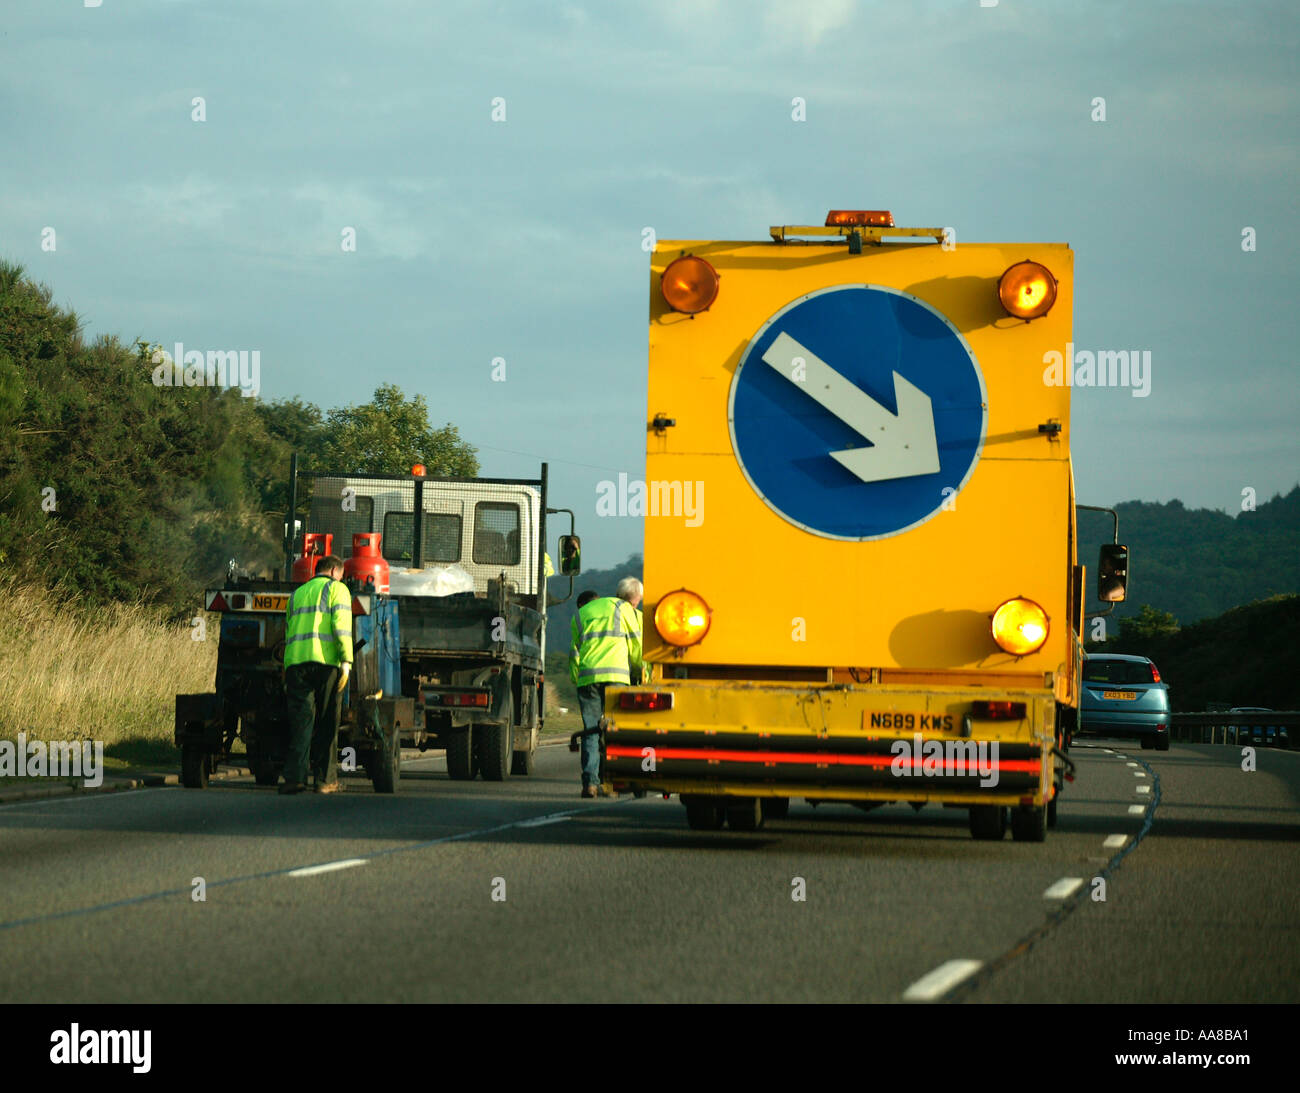 LANE CLOSURE AND ROADWORKS ON MOTORWAY ENGLAND BRITAIN UNITED KINGDOM UK - Stock Image